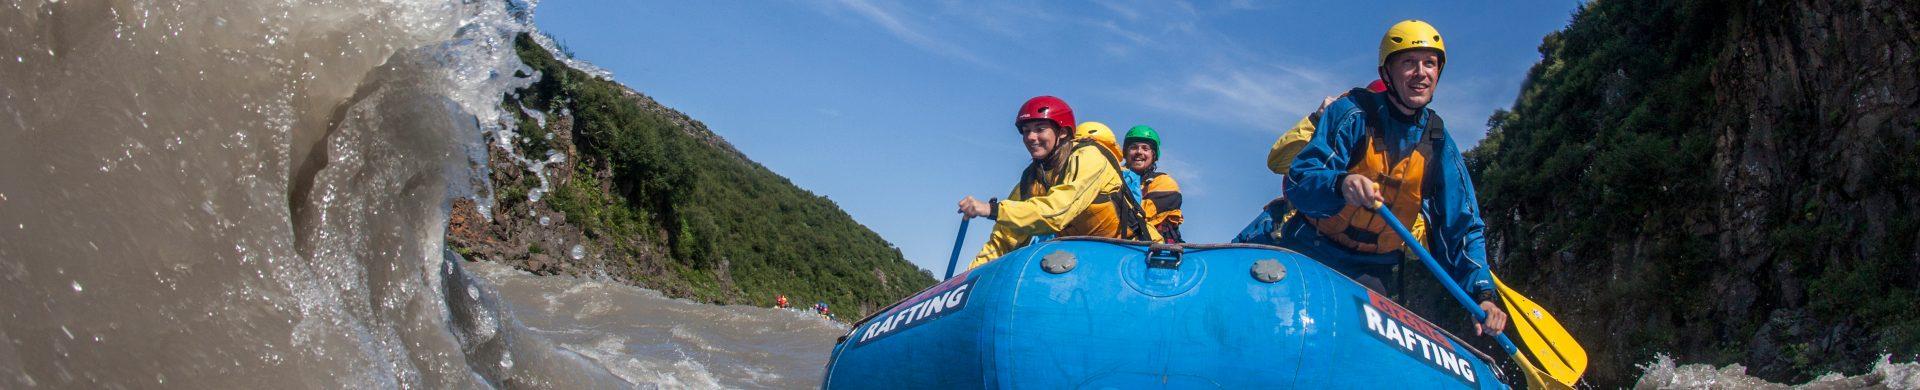 rafting vacances islande